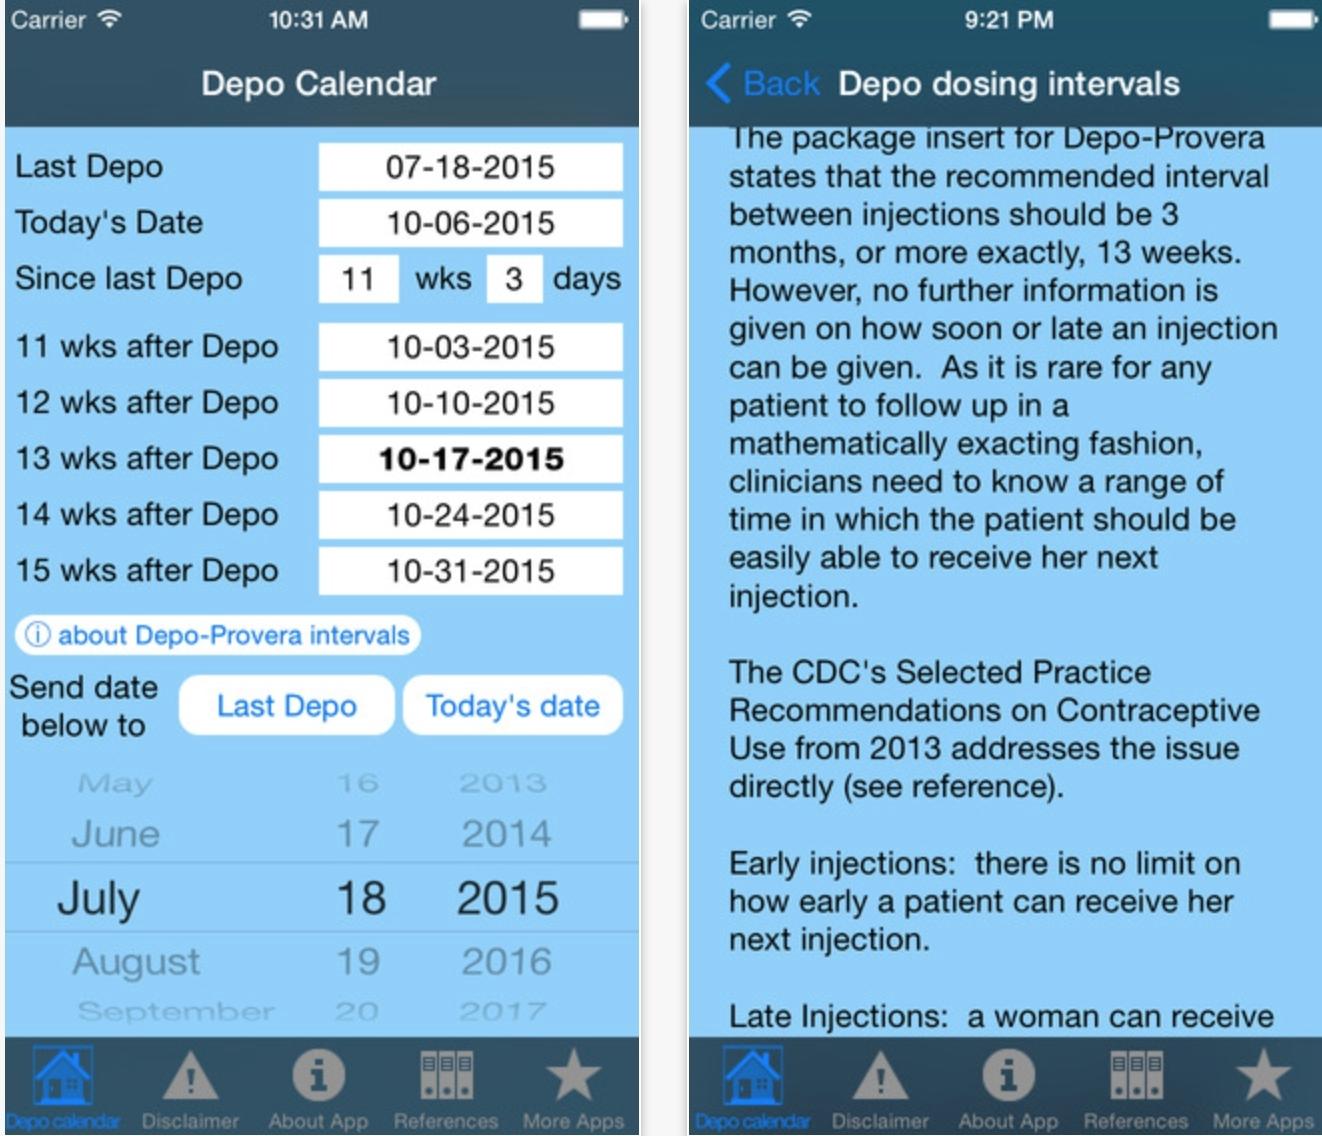 Depo Calendar 2020 Printable - Template Calendar Design  Depo Provera Schedule By Date